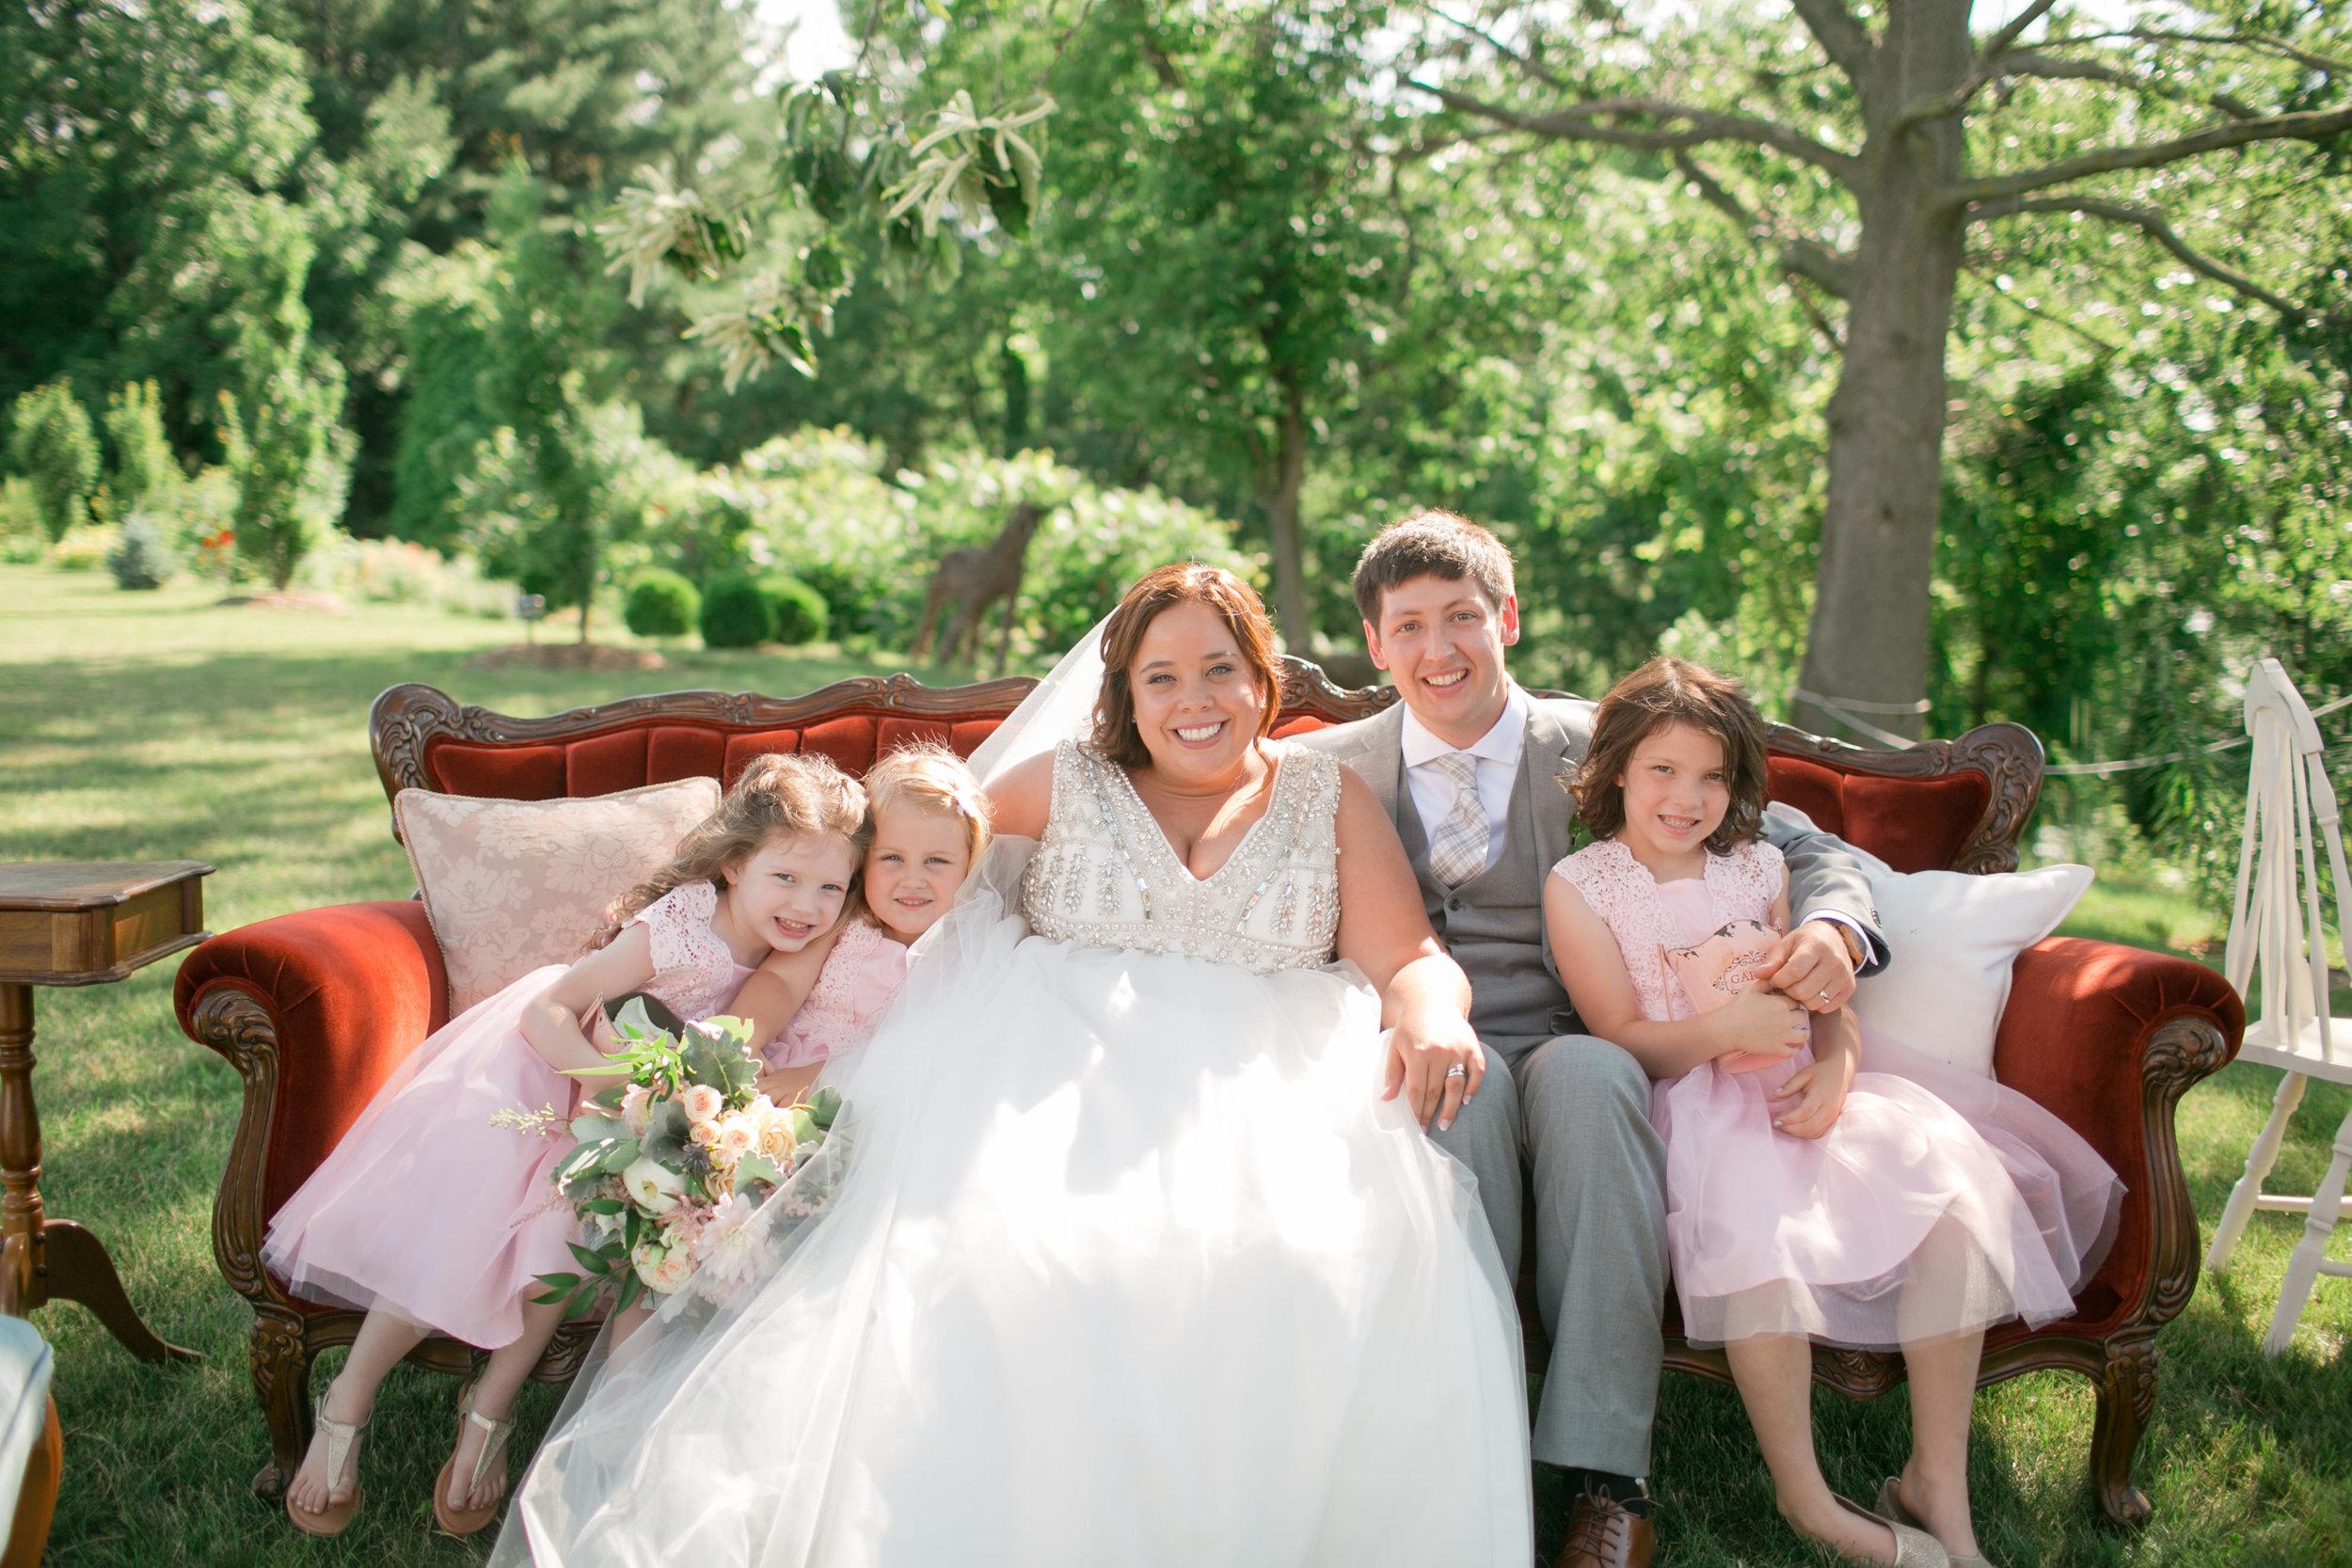 Kimberley + Cameron - Daniel Ricci Weddings - High Res. Finals-328.jpg